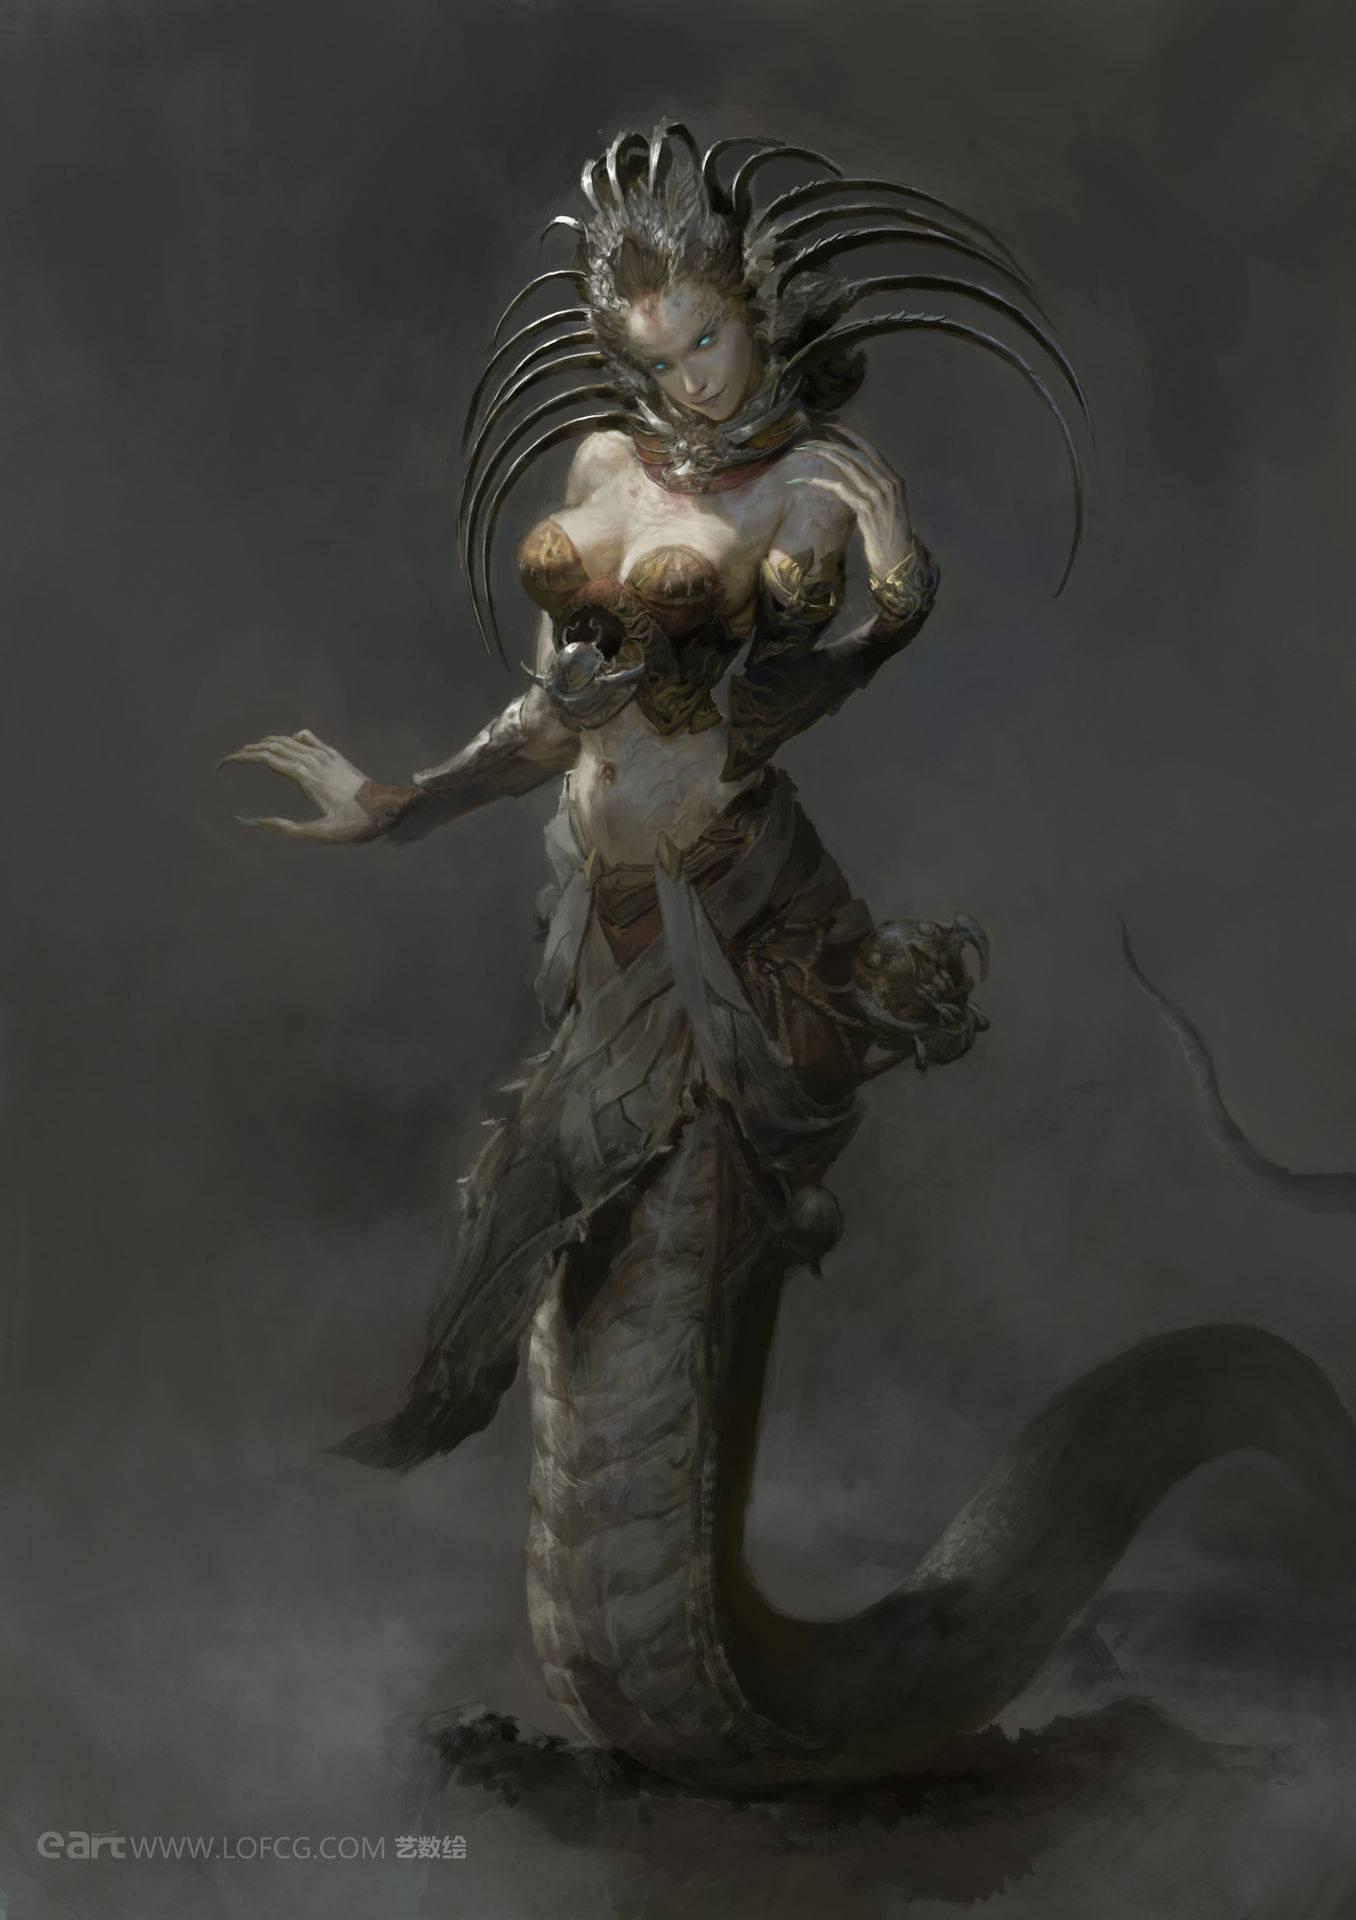 https://orig00.deviantart.net/e43f/f/2015/074/3/2/the_devil_virgin_by_fenghuaart-d8lsdo5.jpg